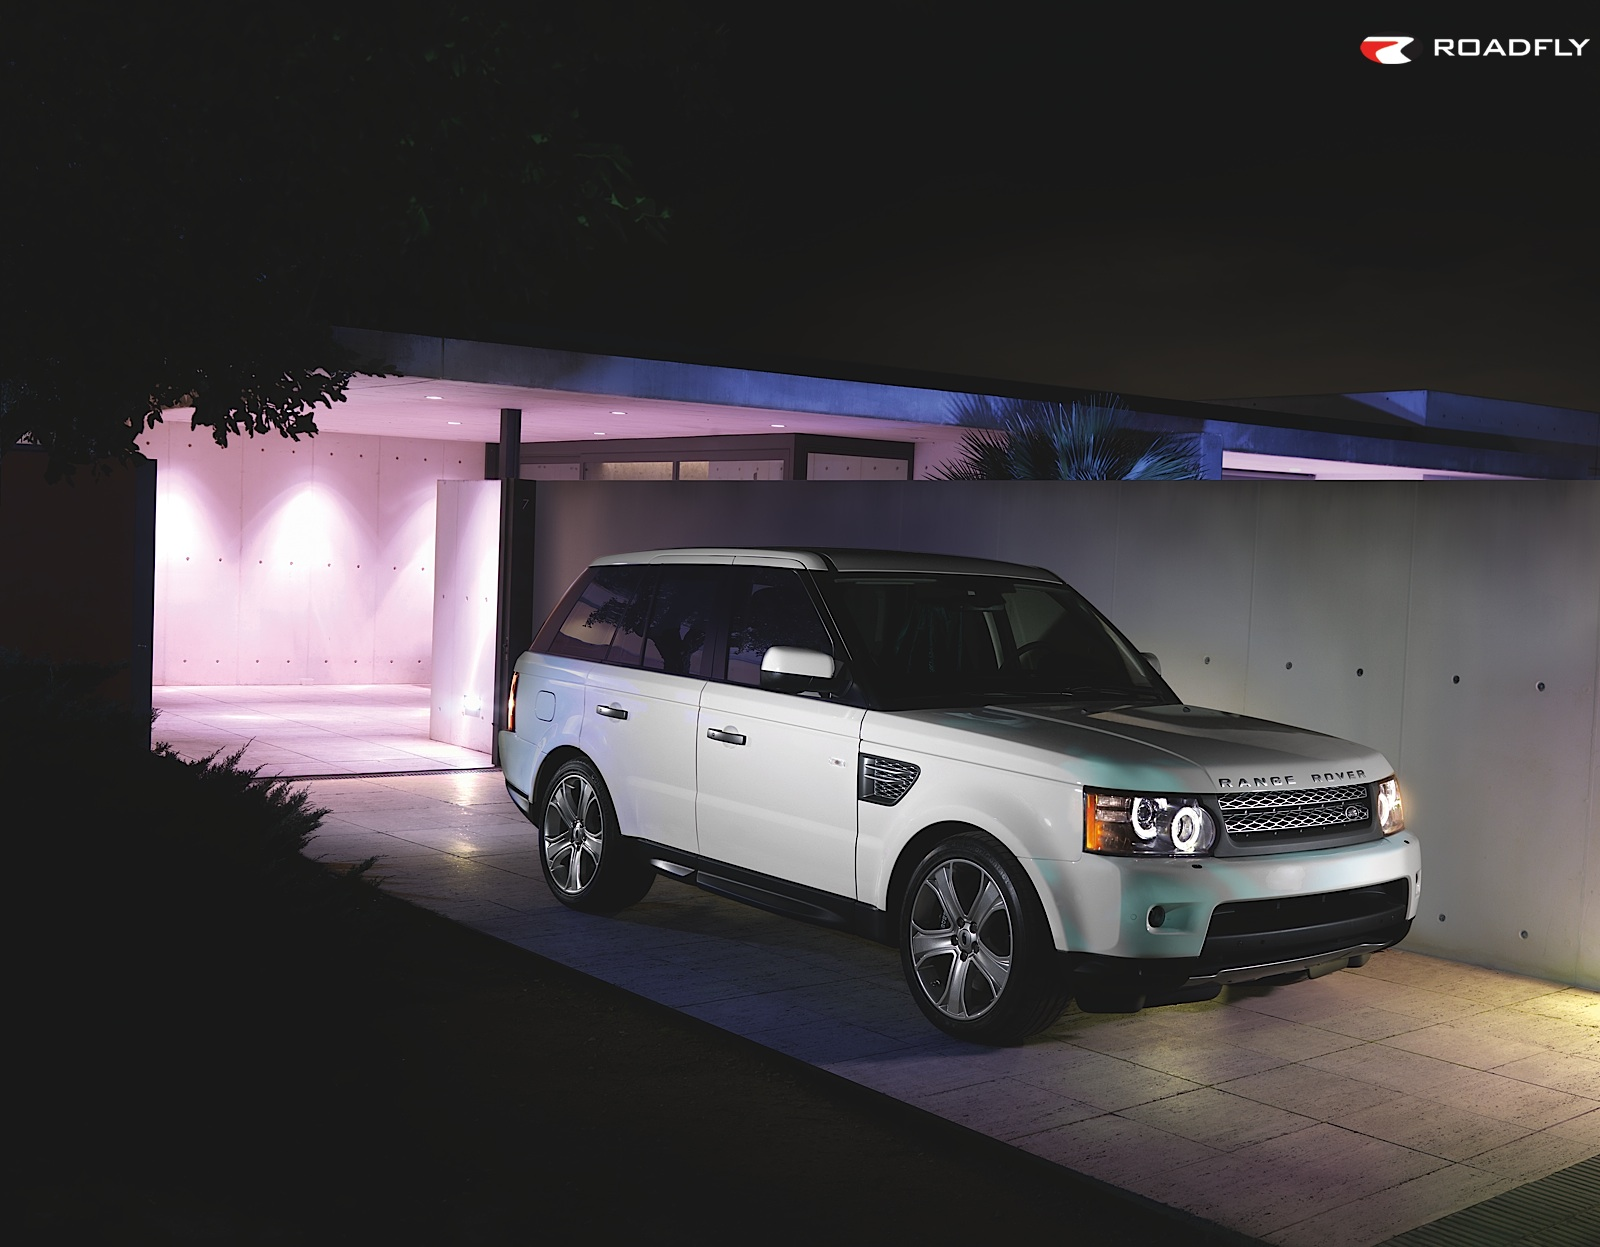 lea michele 2010 range rover sport supercharged. Black Bedroom Furniture Sets. Home Design Ideas